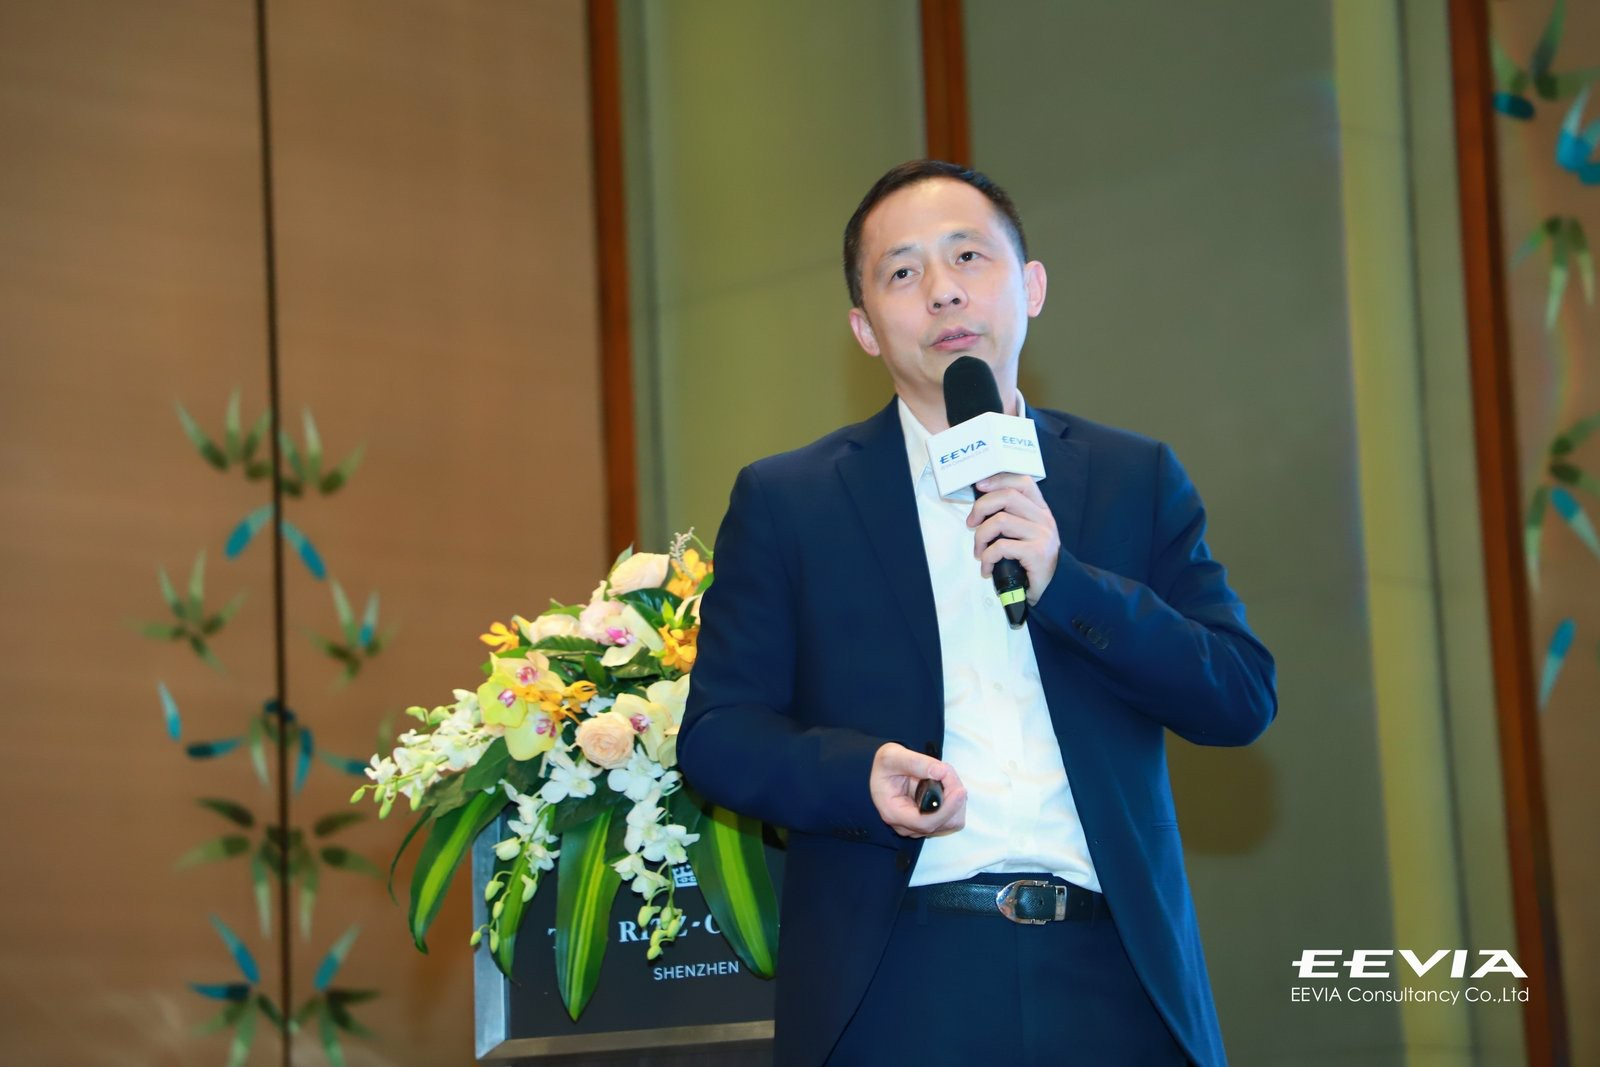 Qorvo江雄:UWB技术在消费市场的应用和前景解读